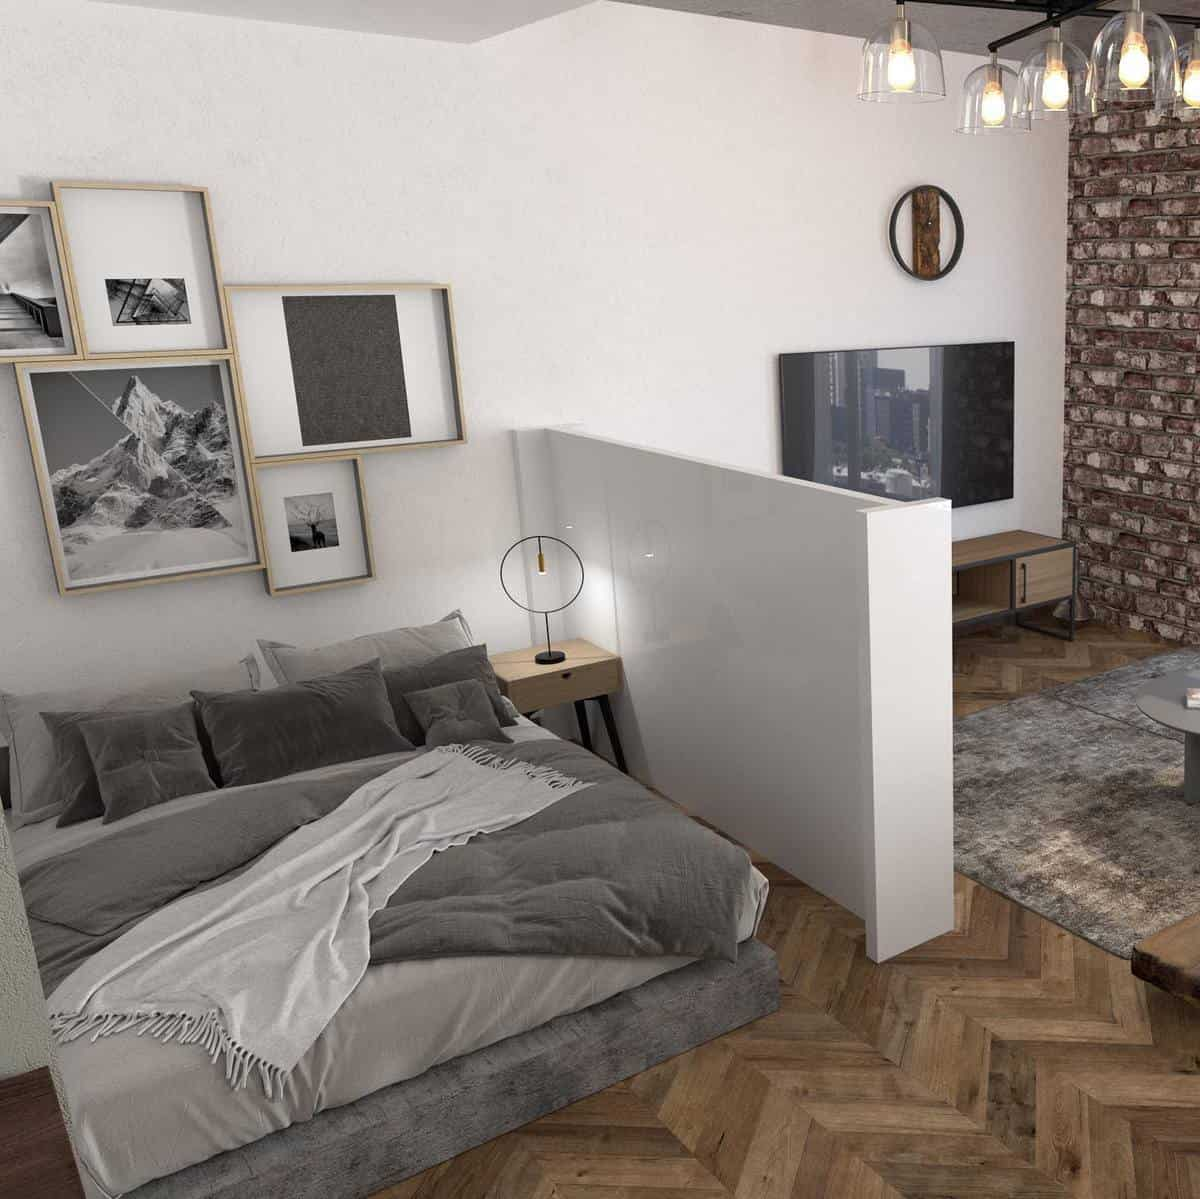 Bedroom Temporary Wall Ideas -diyversify